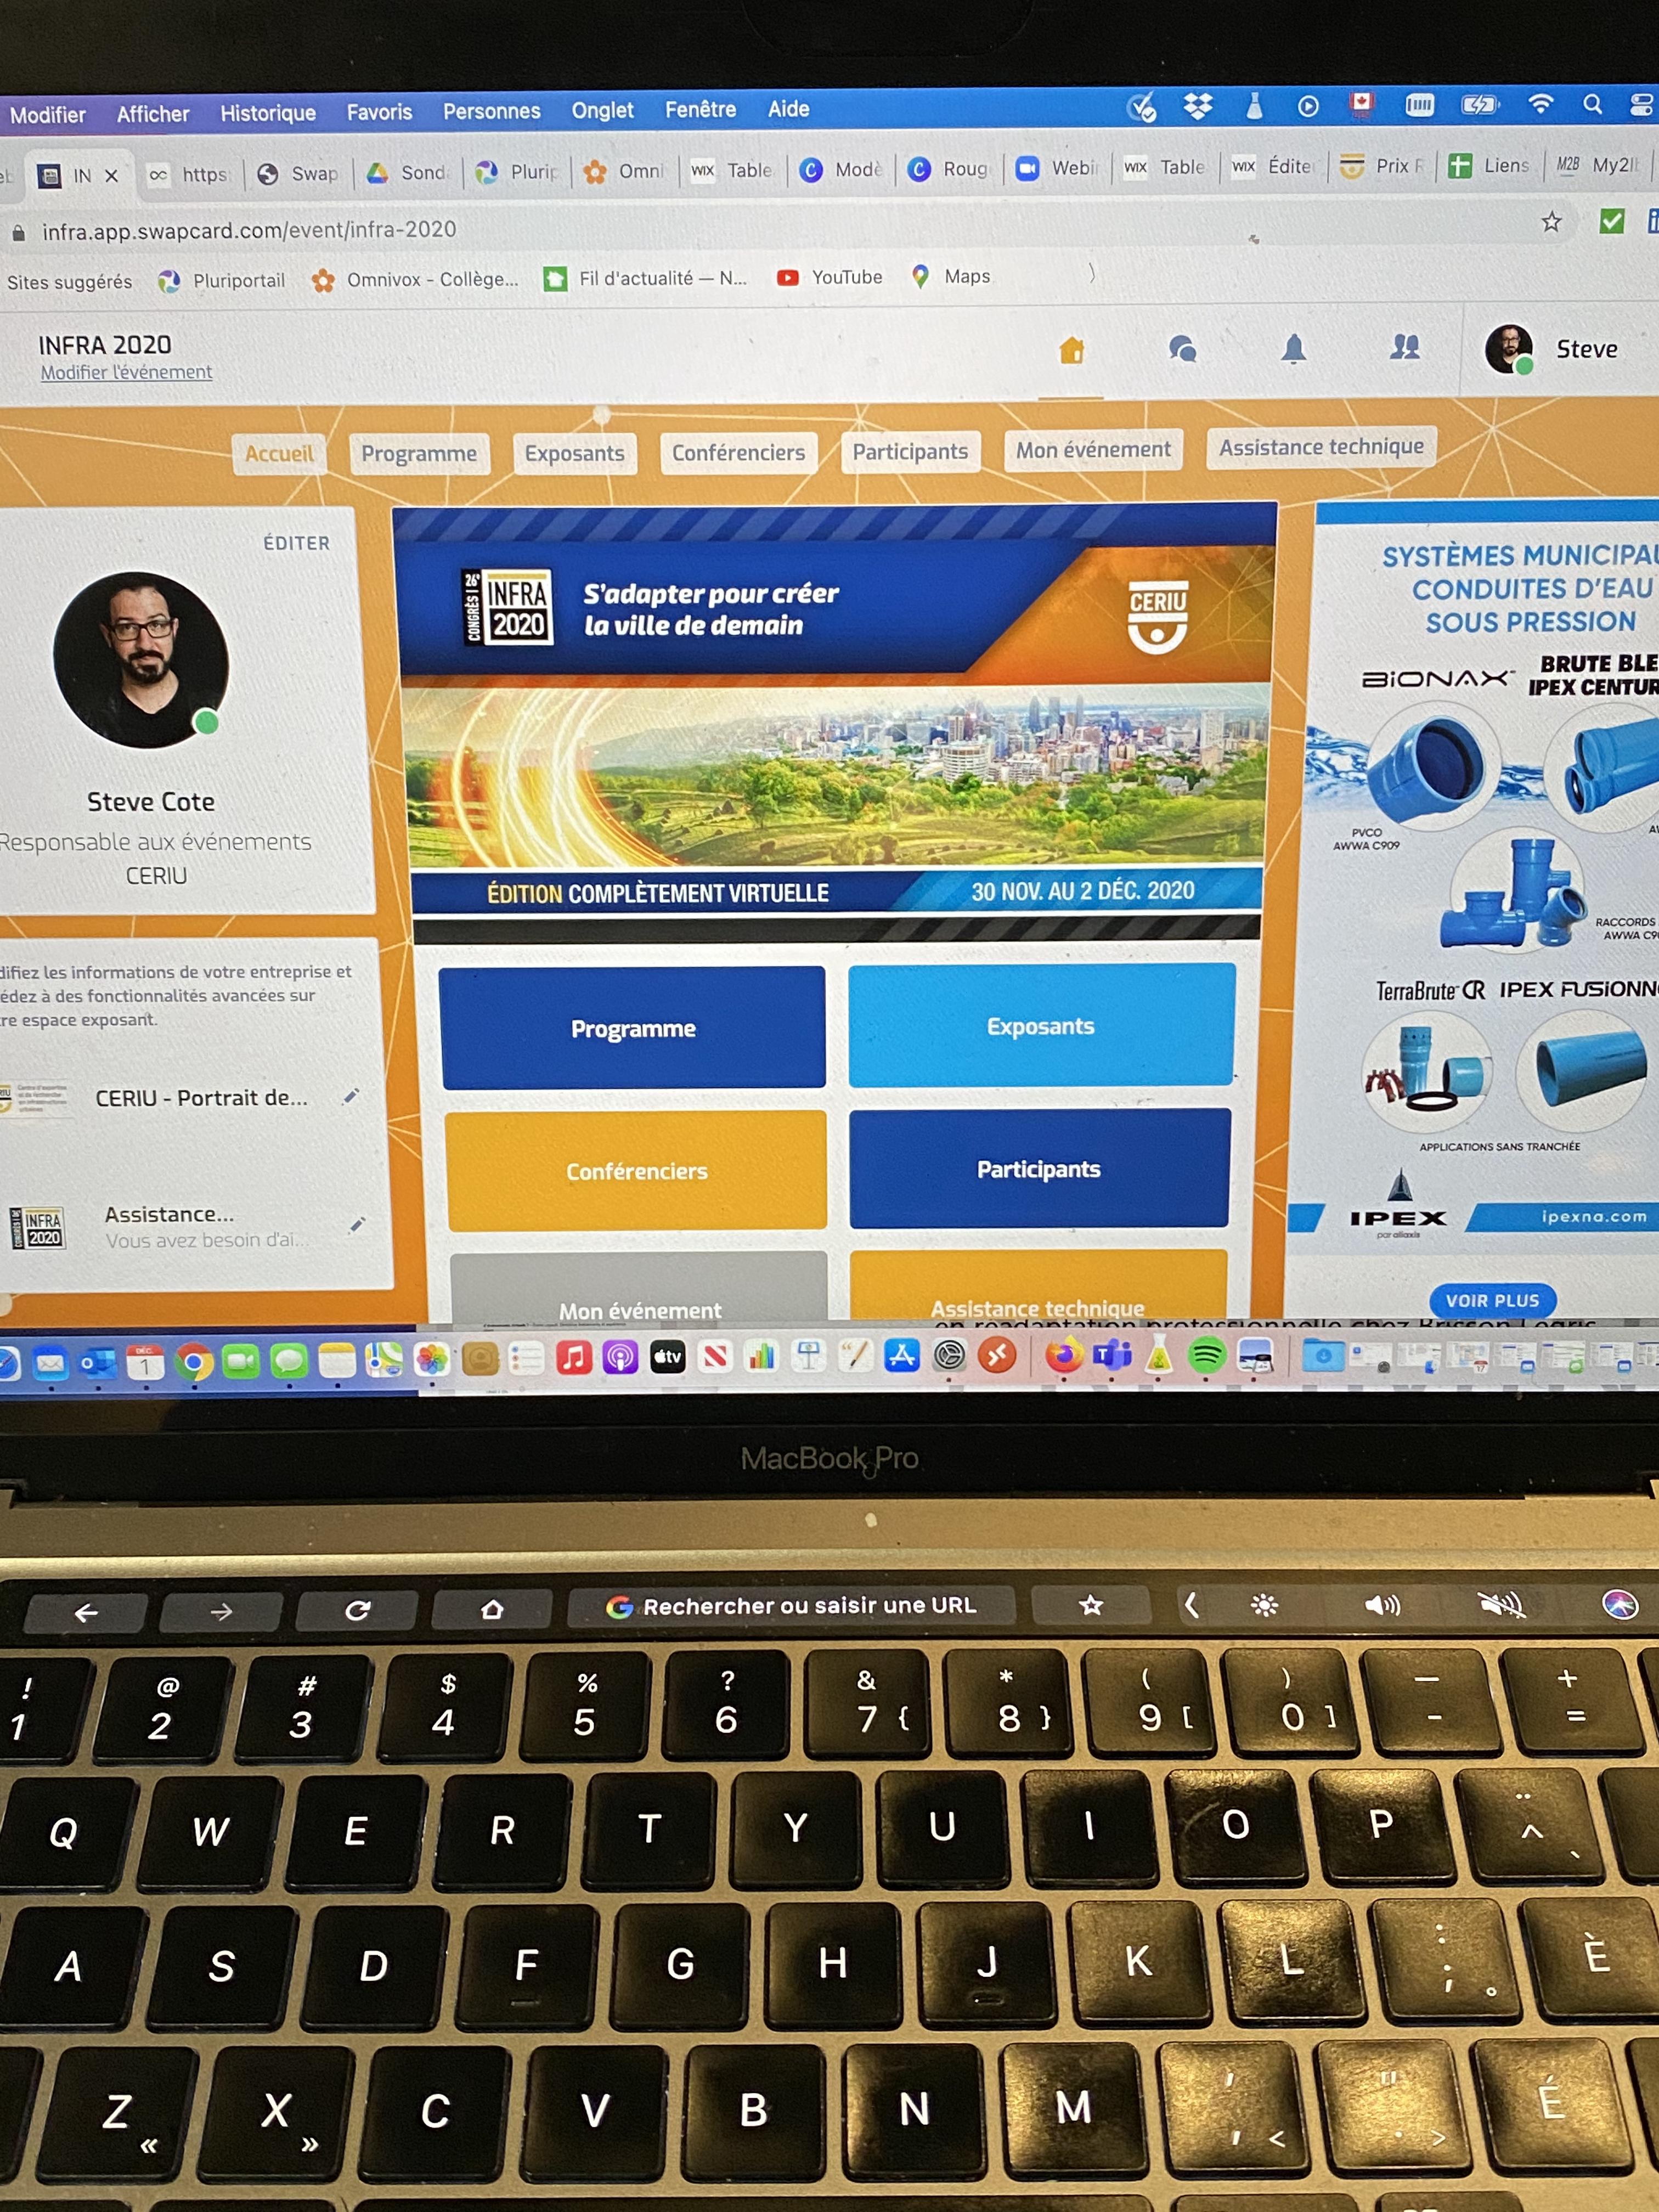 Congrès virtuel